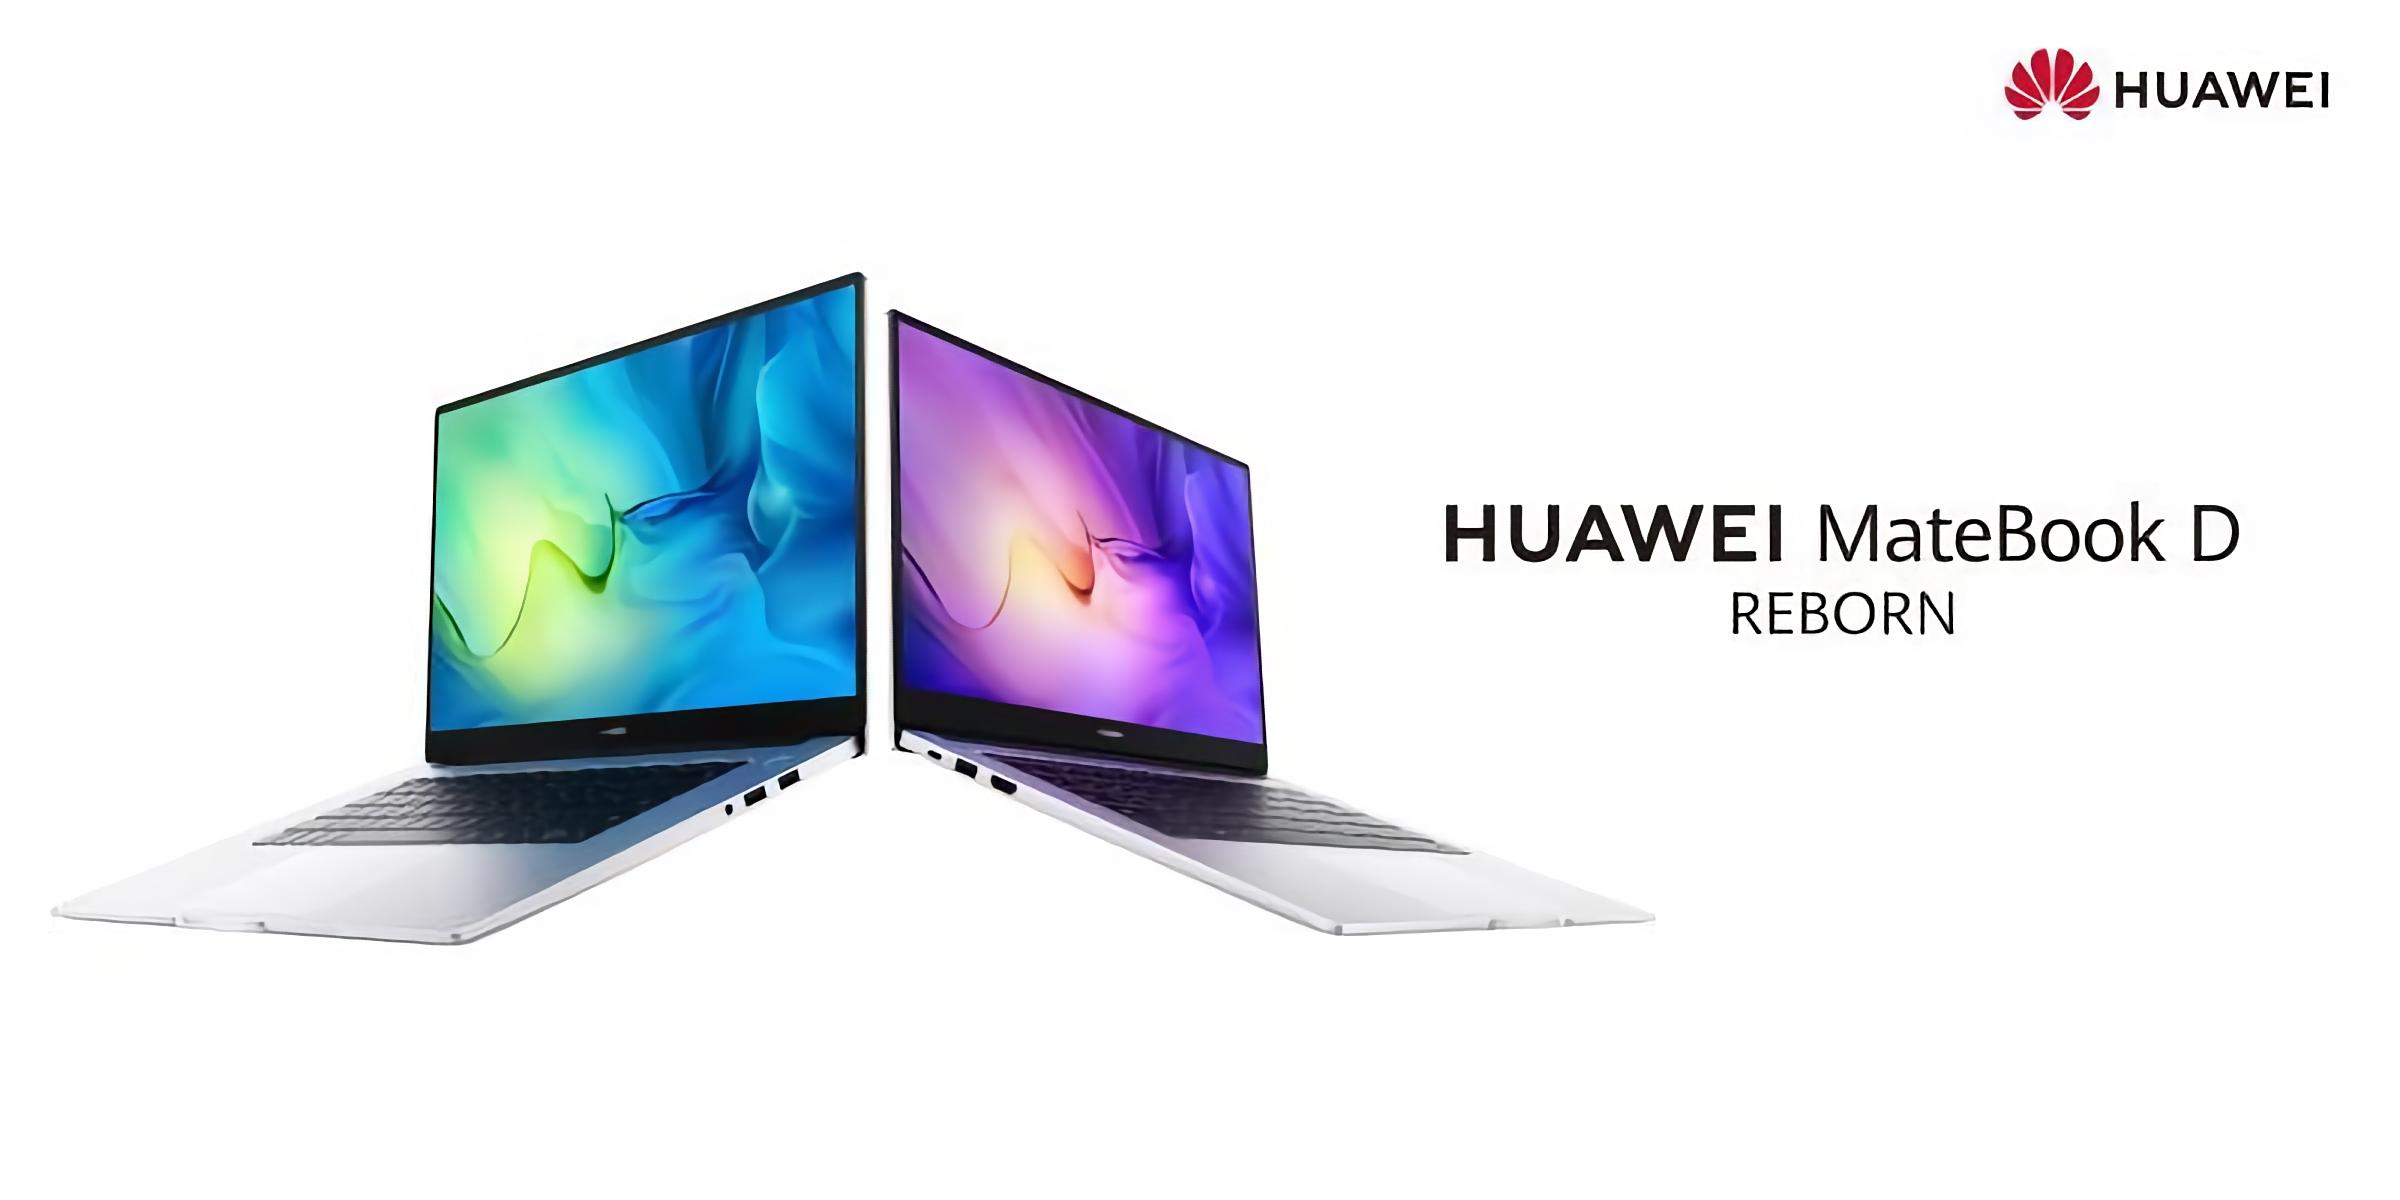 Huawei MateBook D14/D15: обновлённая серия ноутбуков с чипами Intel 11-го поколения